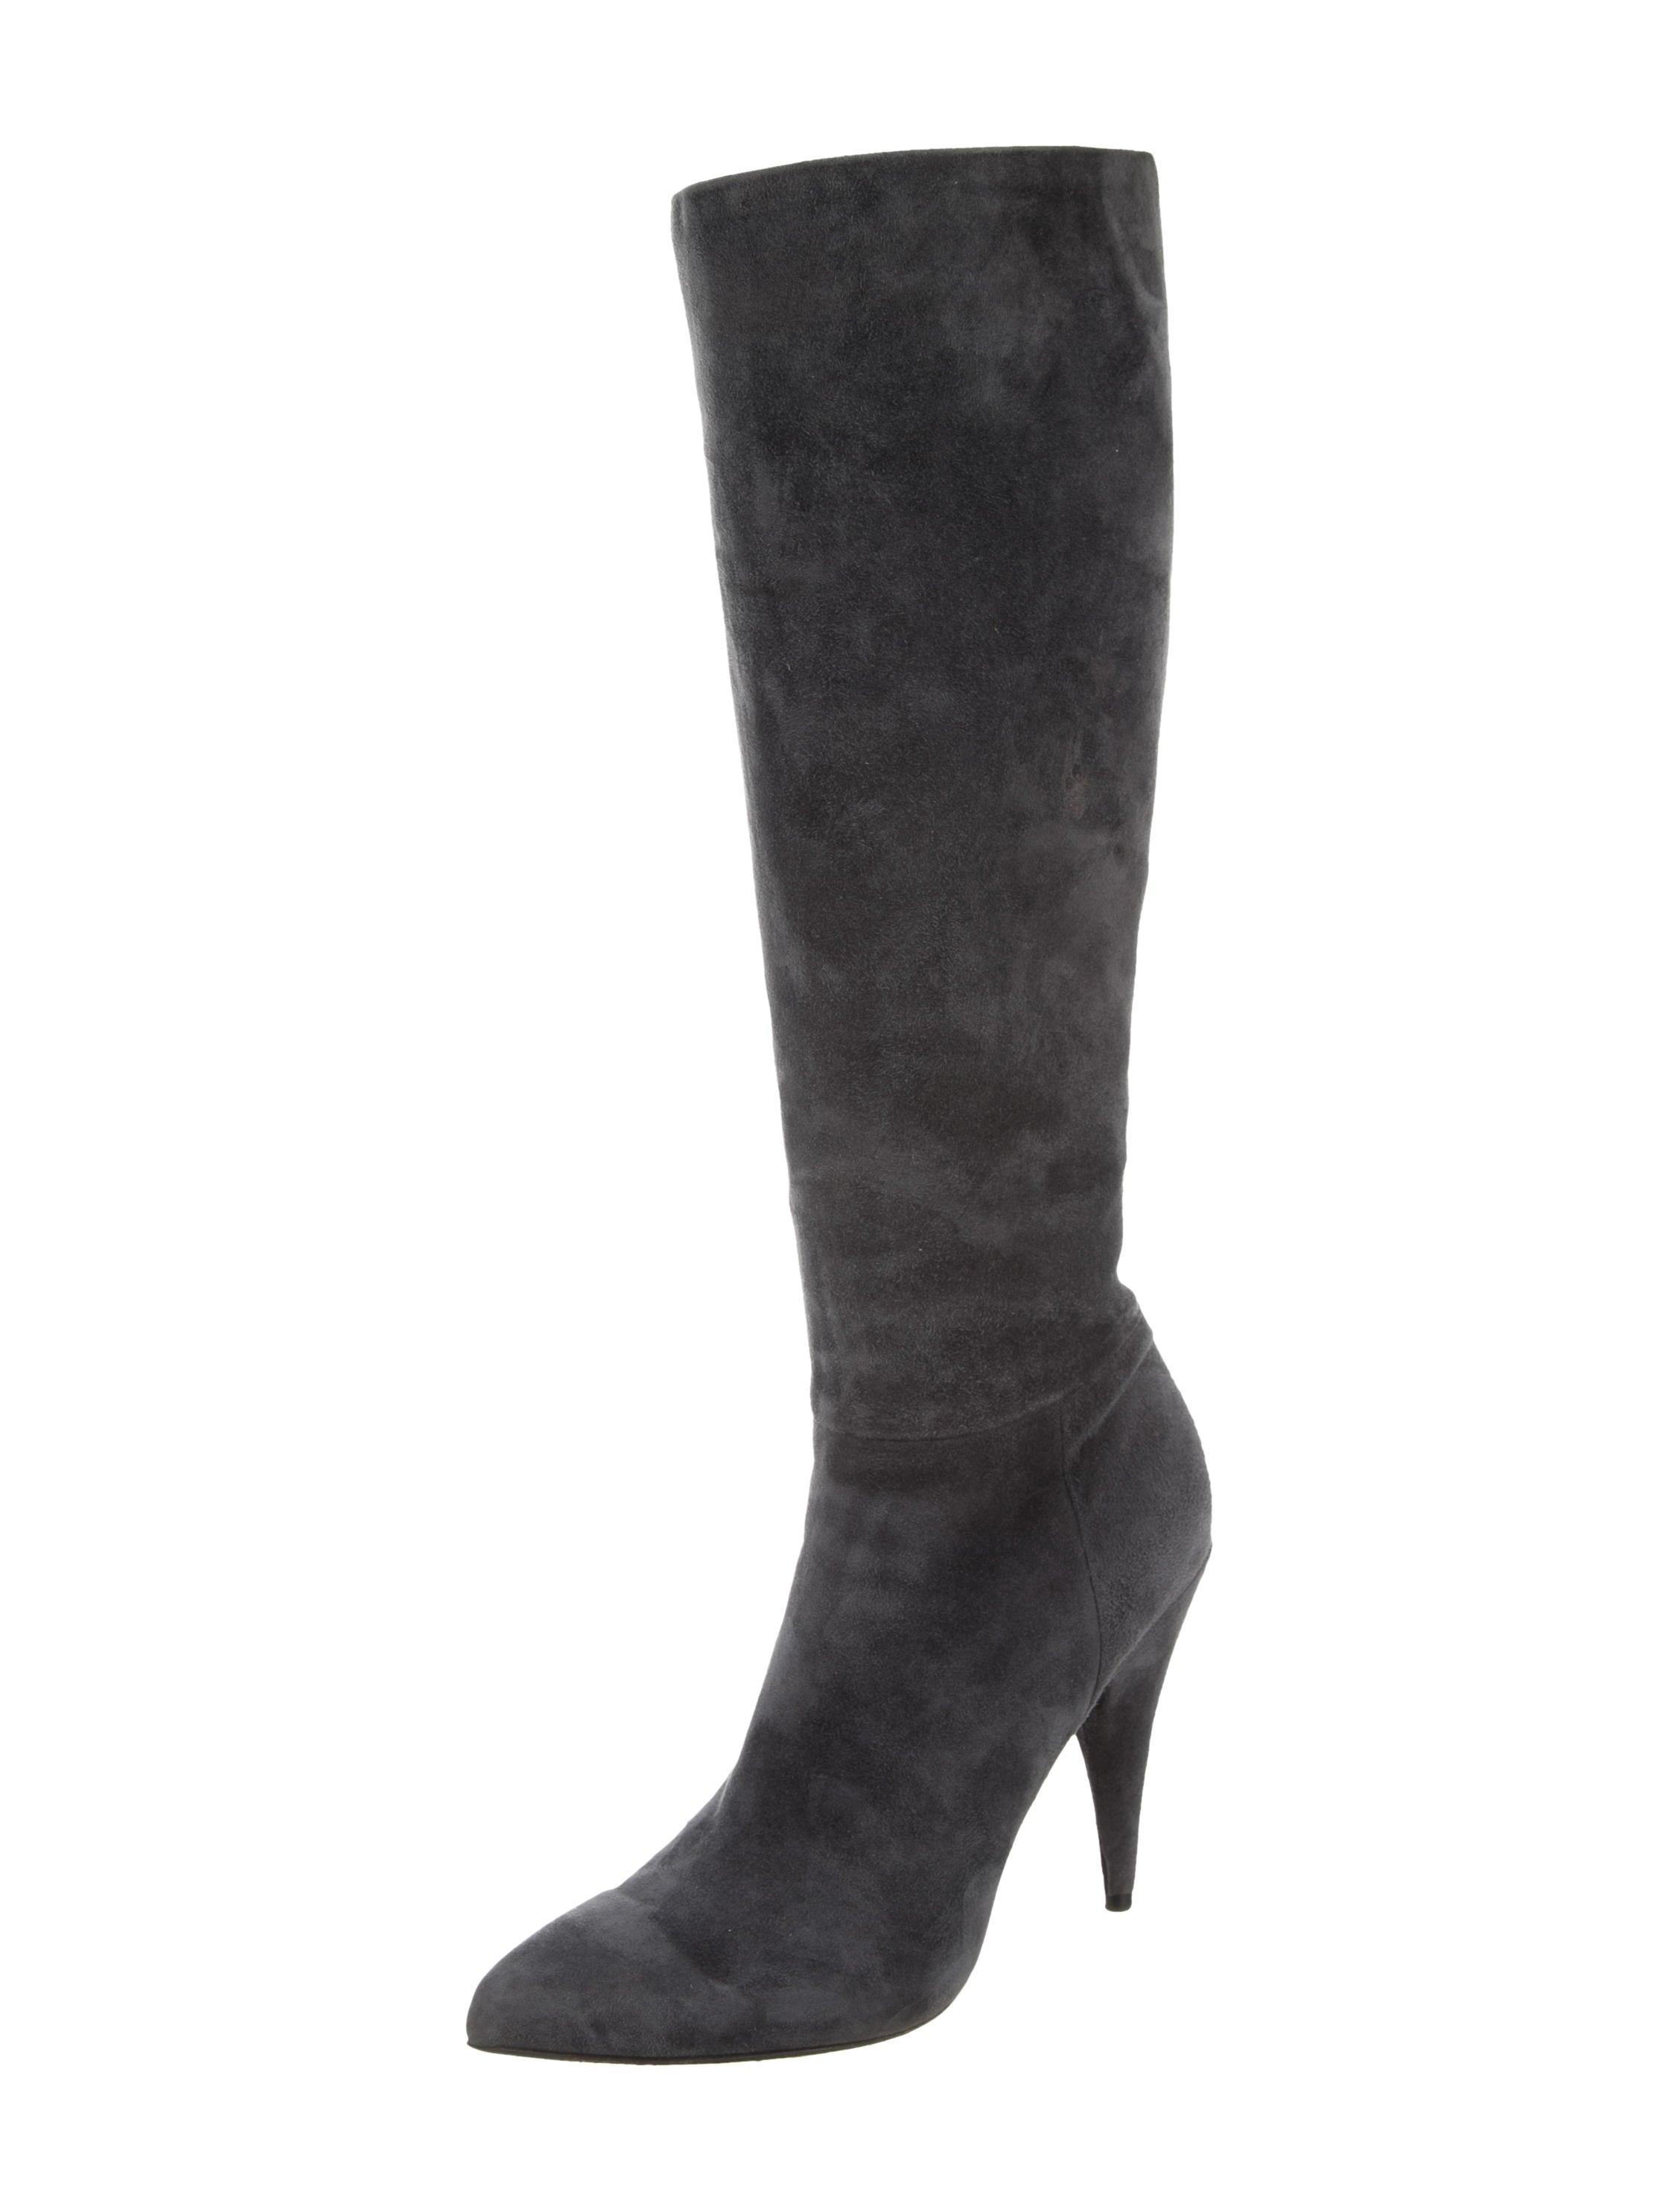 prada pointed toe knee high boots shoes pra128802